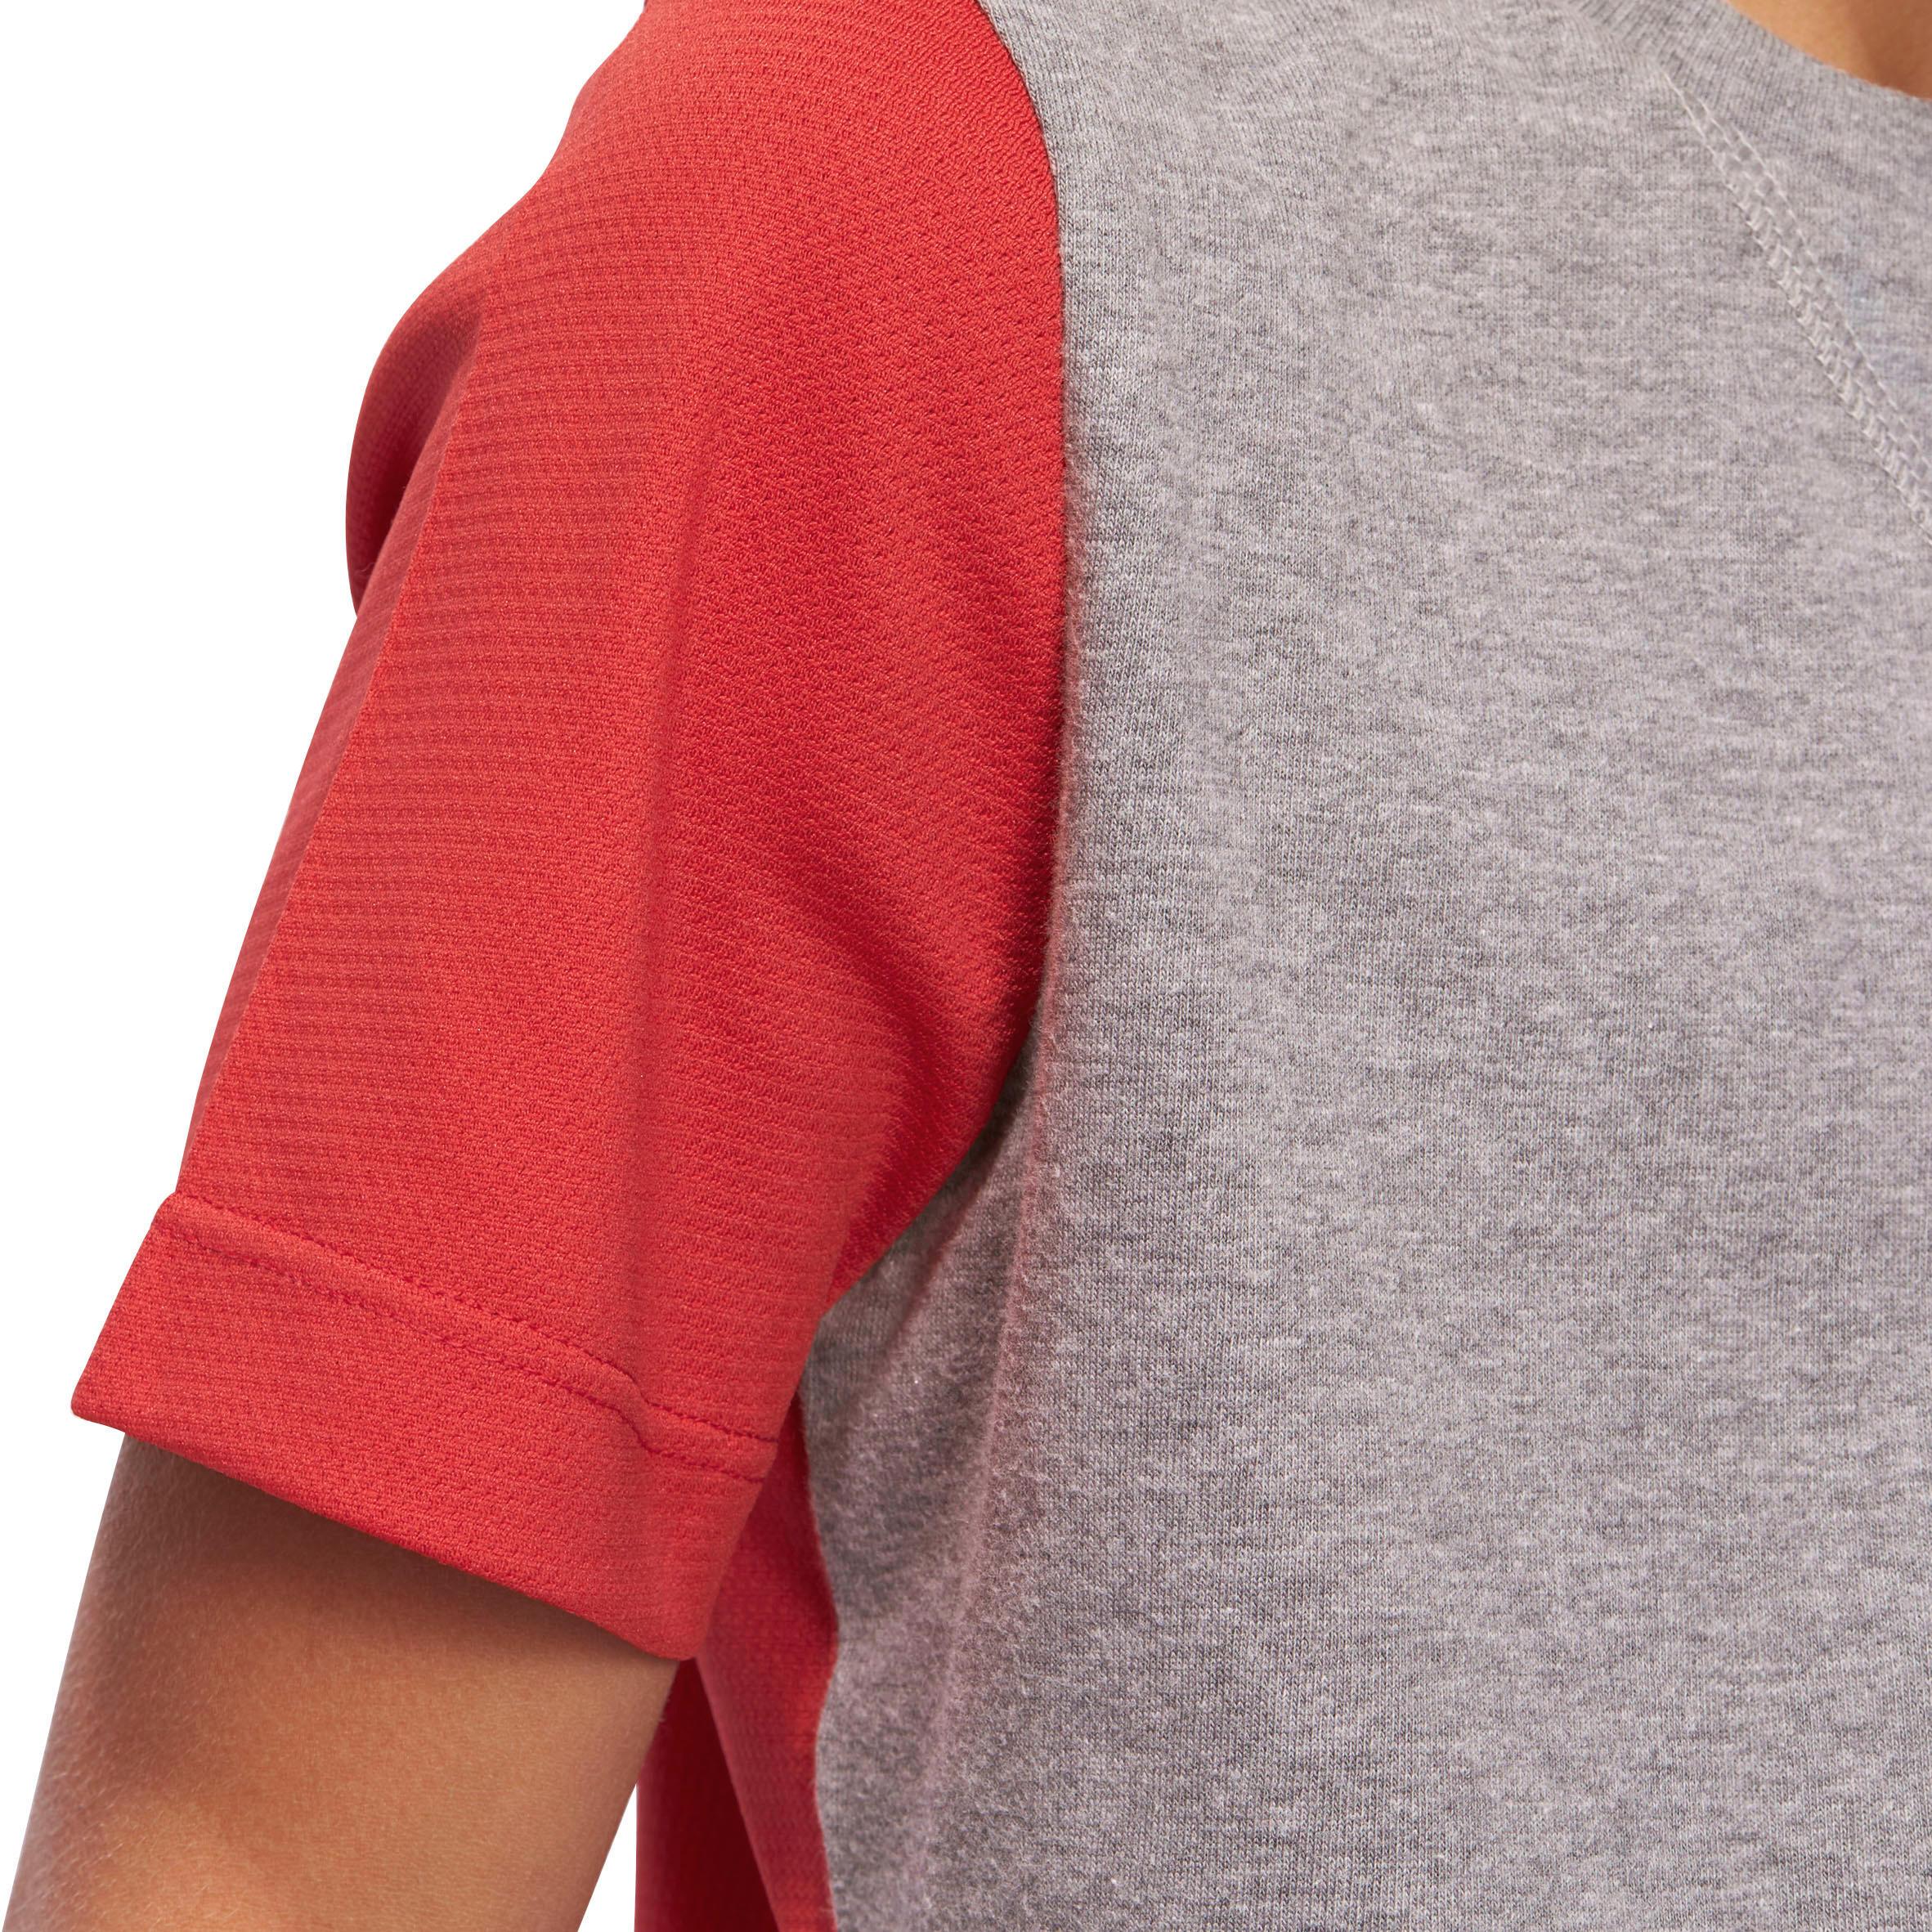 Boys' Gym Short-Sleeved T-Shirt - Grey/Red